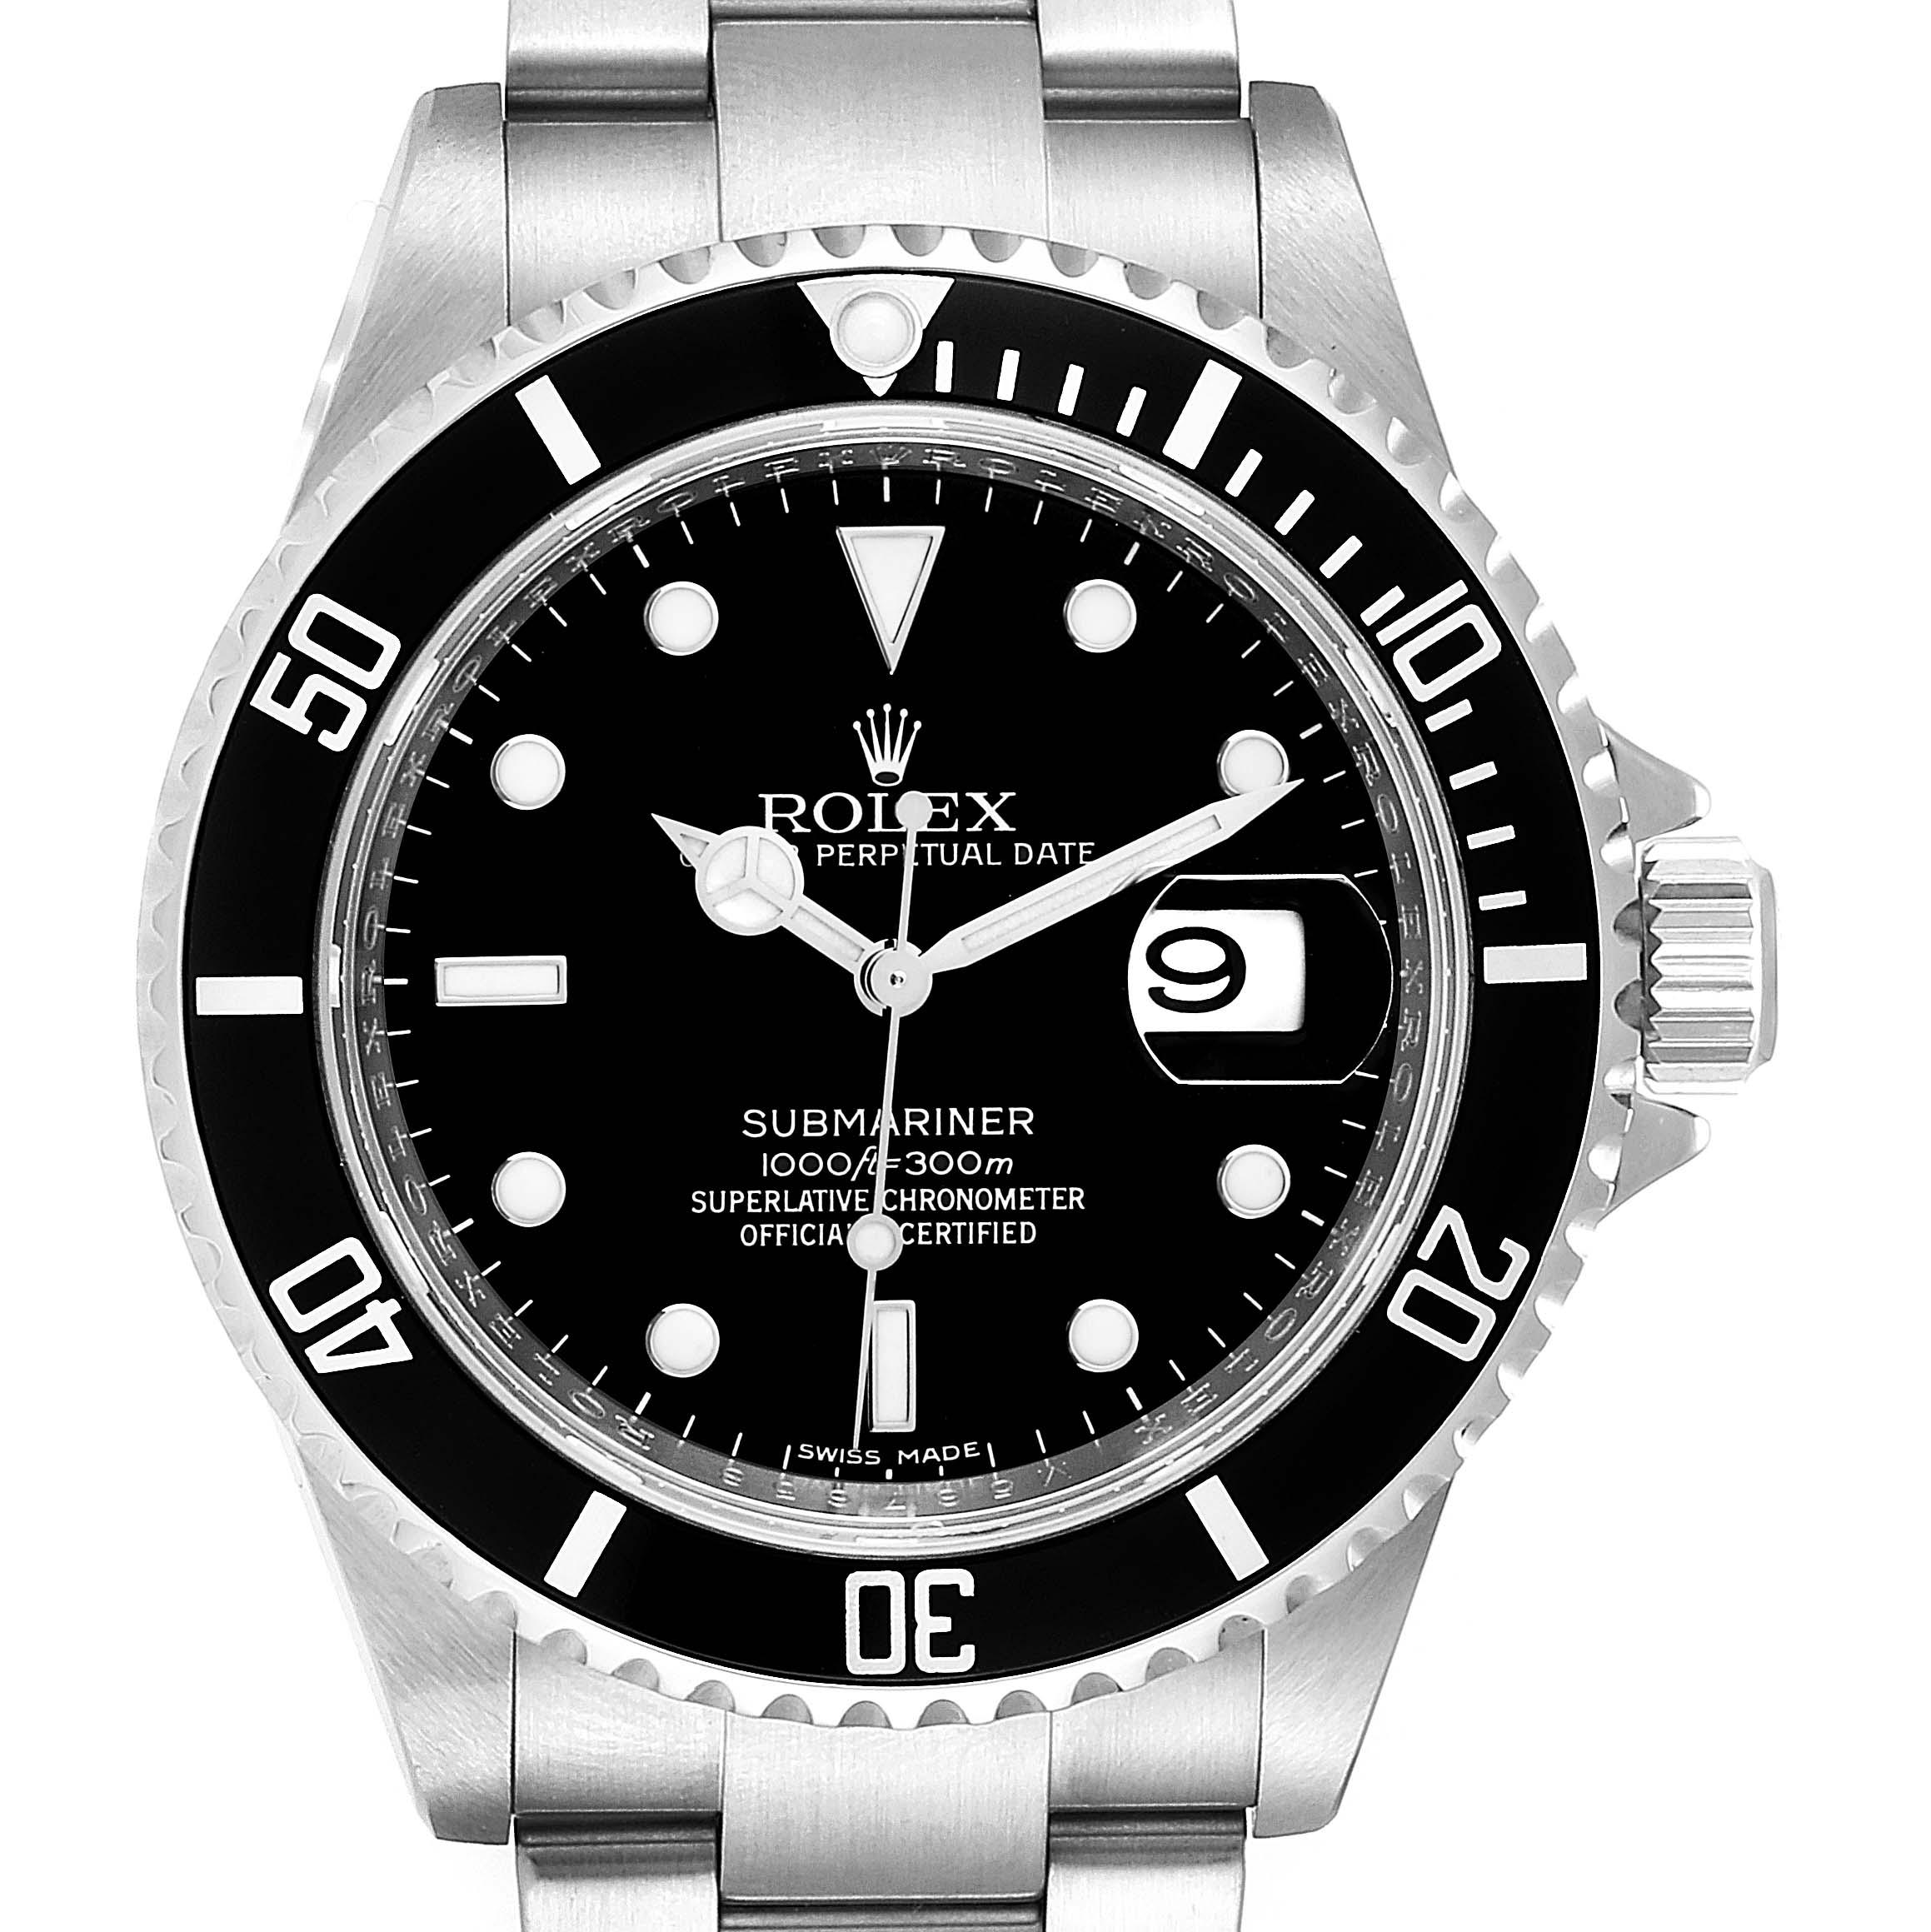 Rolex Submariner Date 40mm Stainless Steel Mens Watch 16610